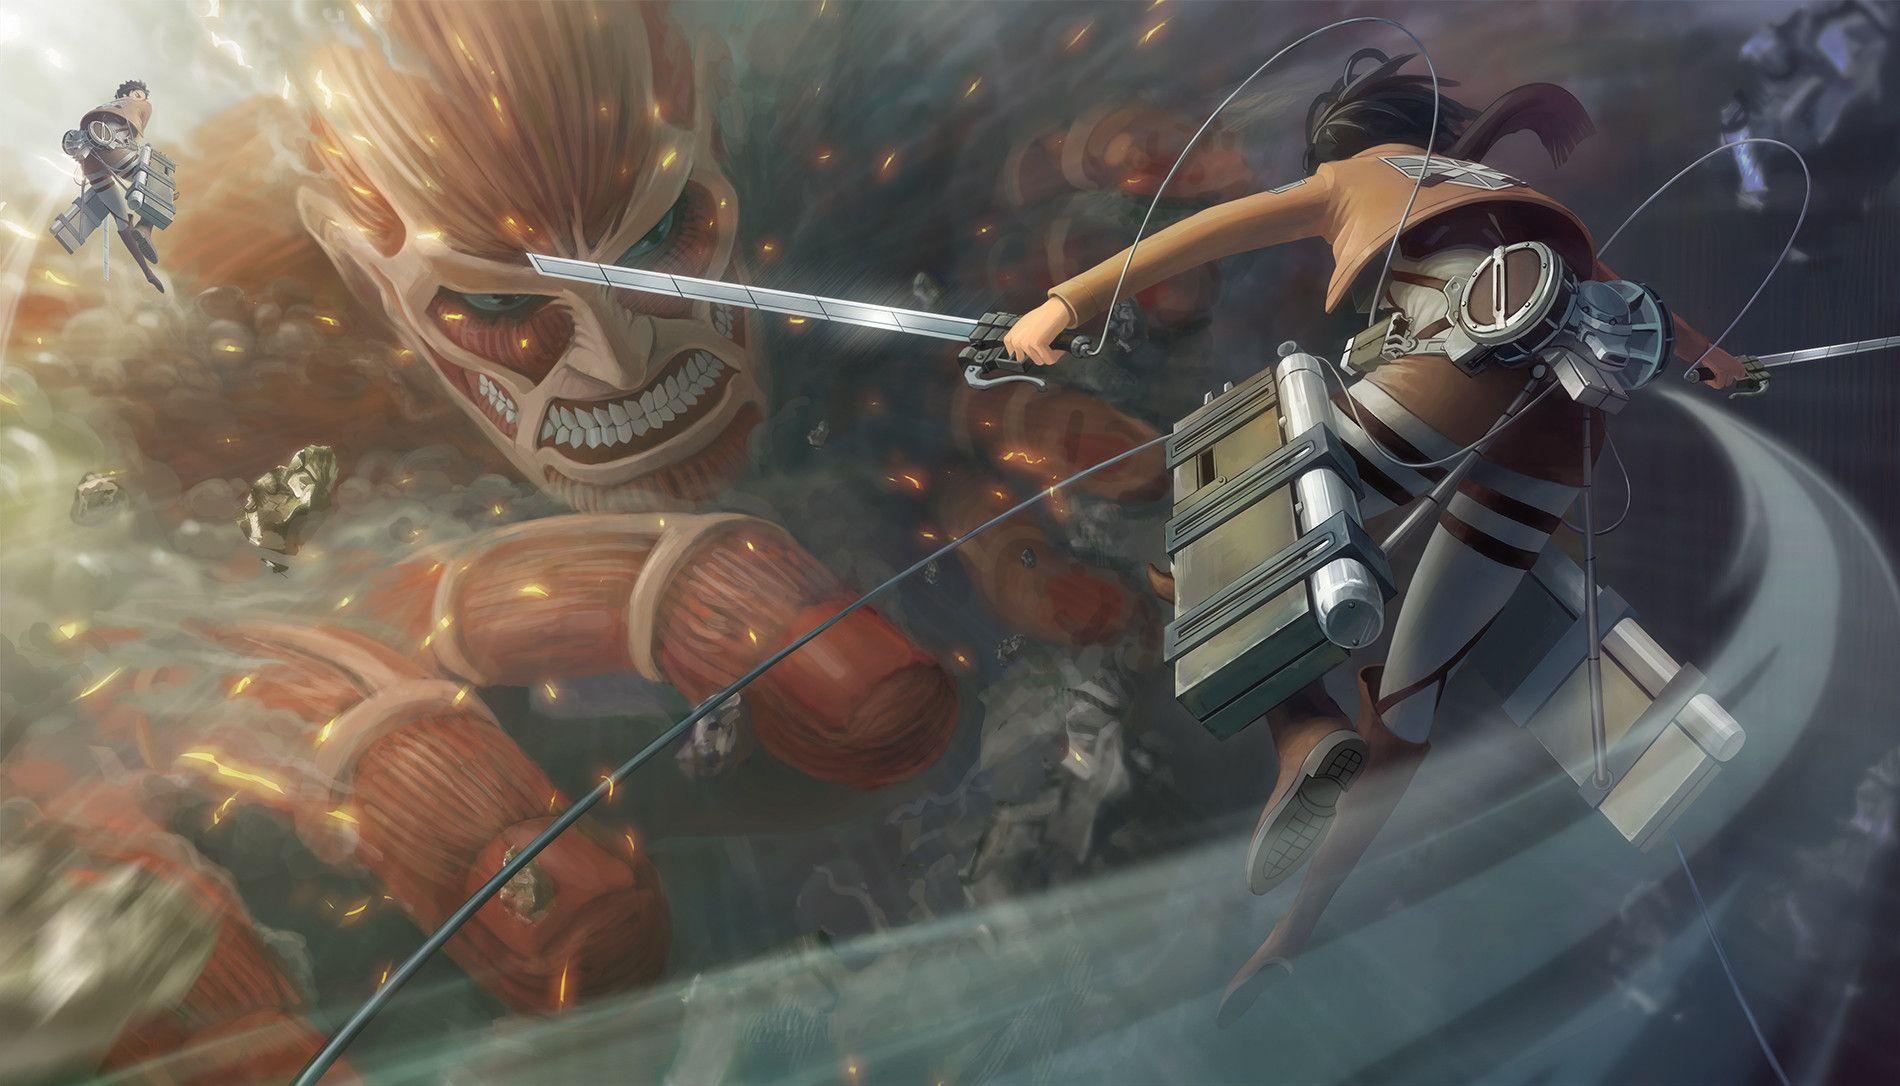 Anime Wallpaper Dump PT2 Attack on titan season Attack on 1900x1086